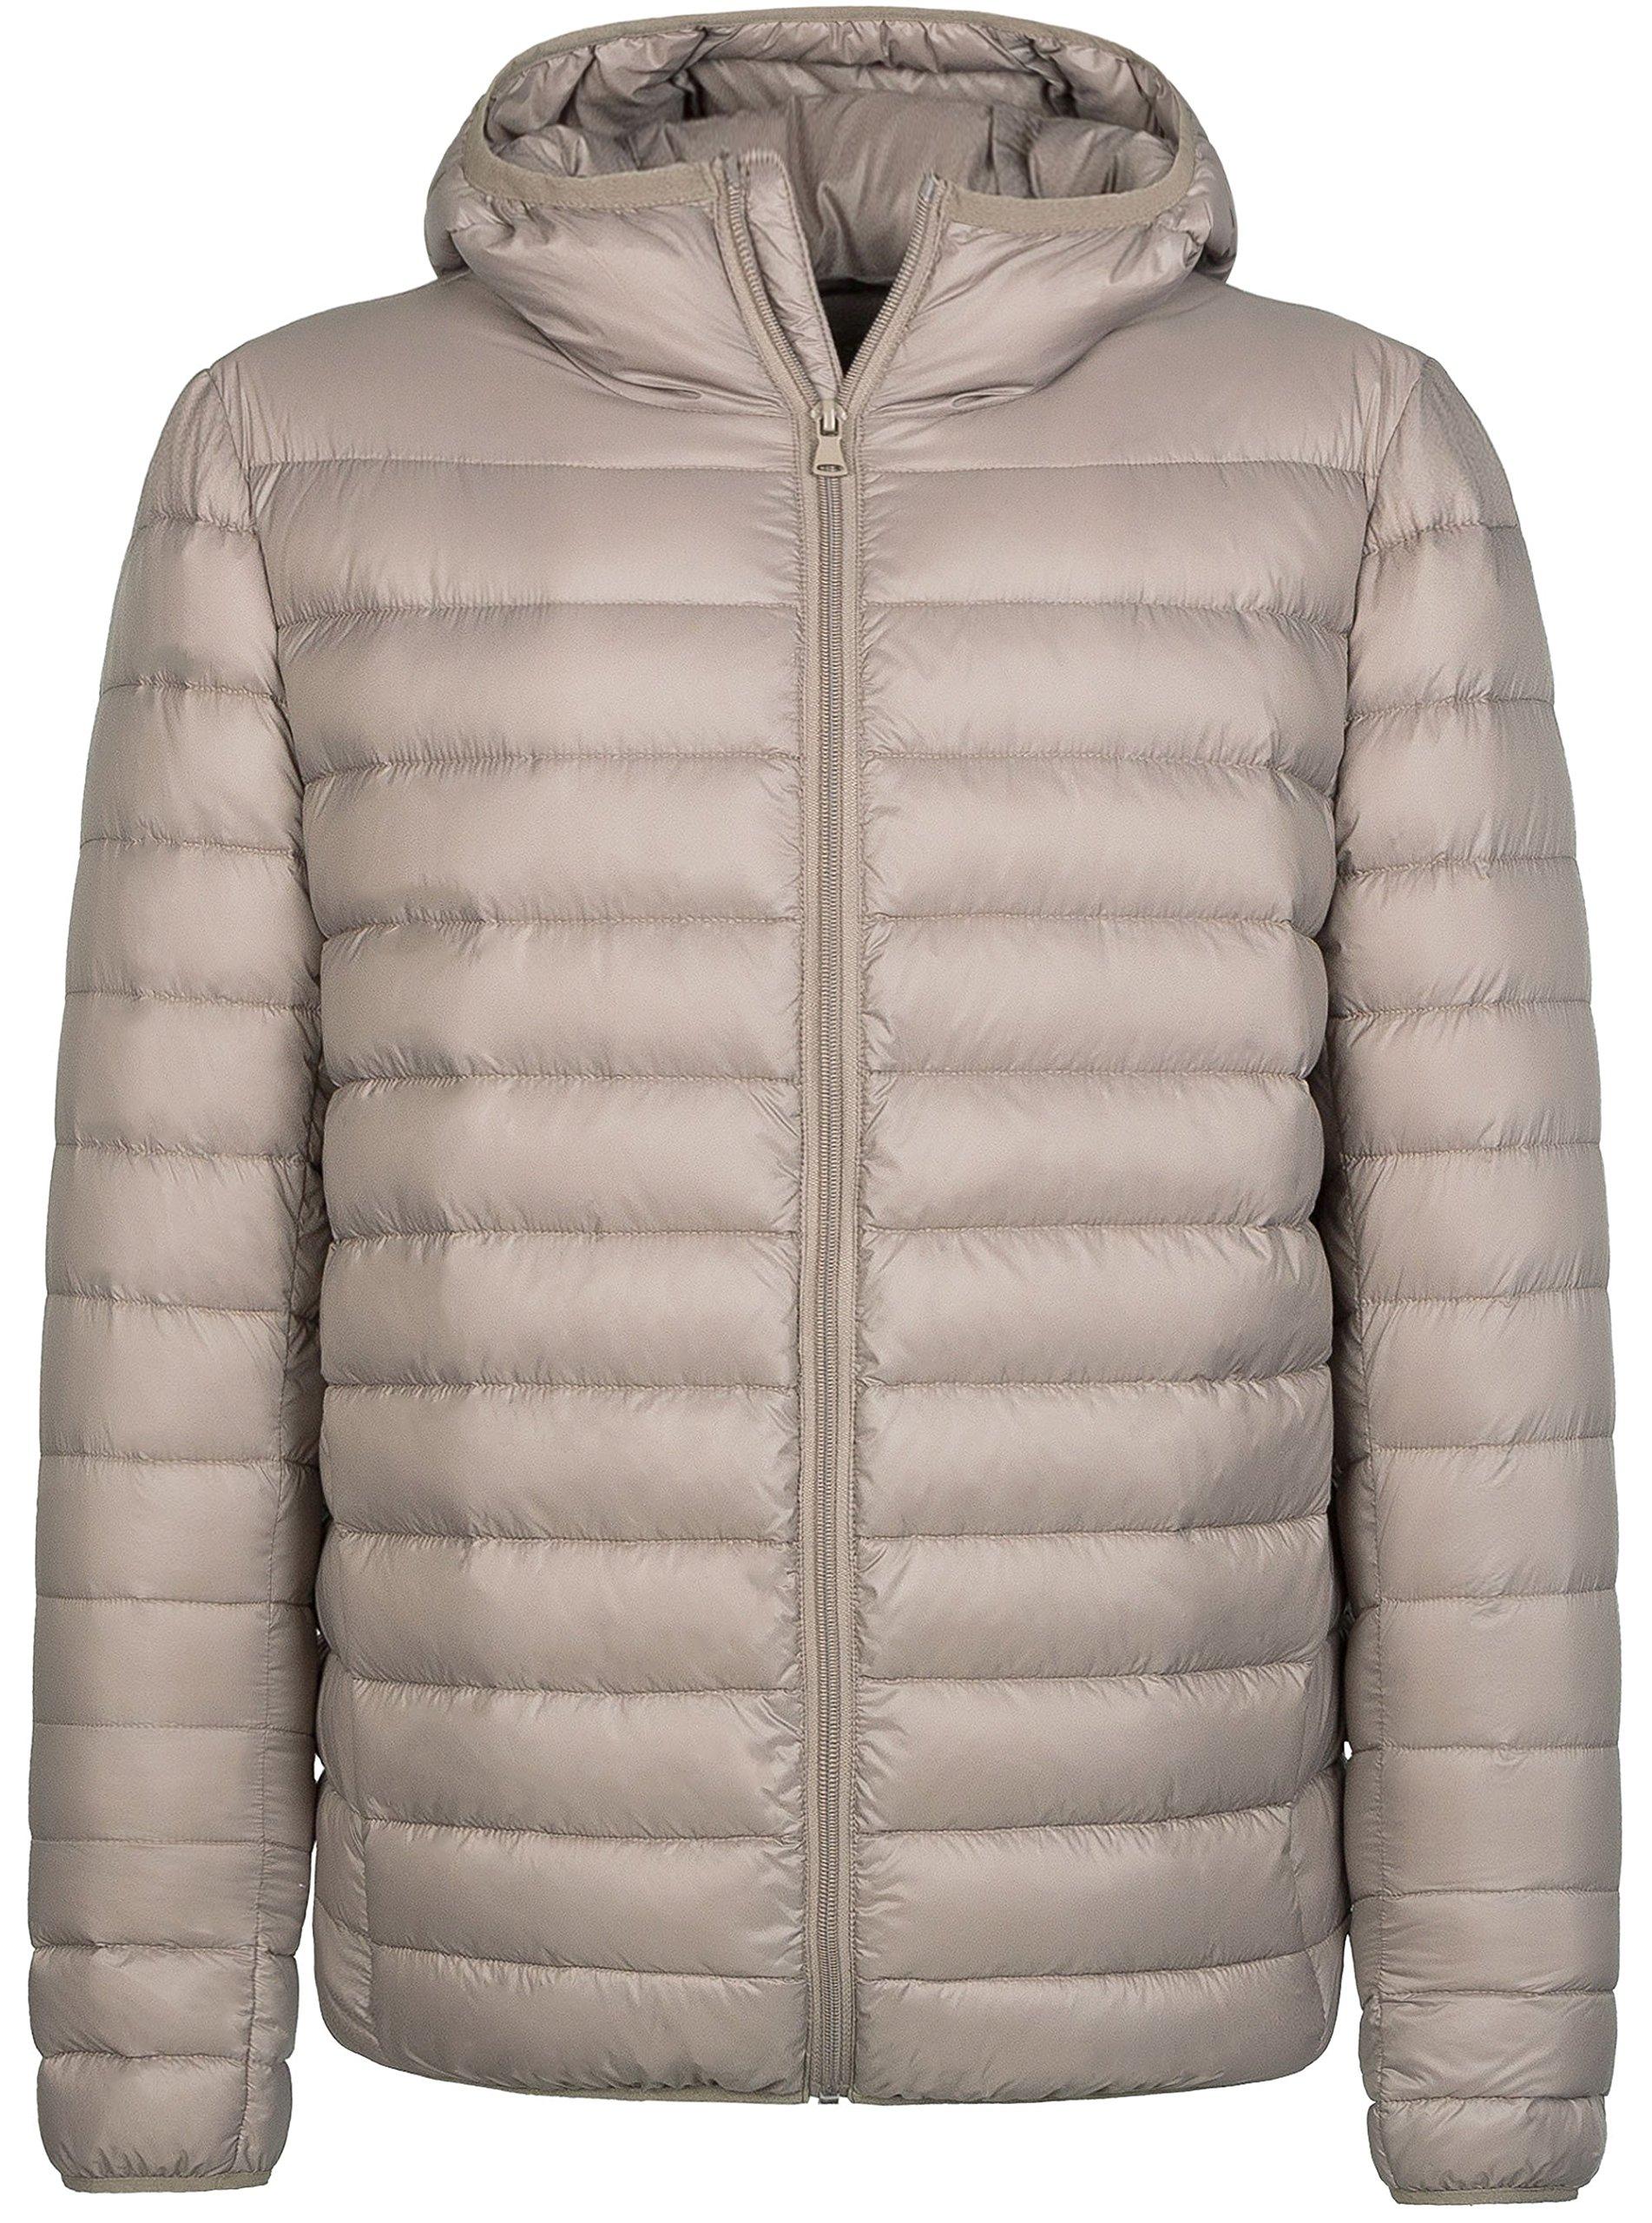 Wantdo Men's Hooded Packable Light Weight Down Jacket Small Khaki